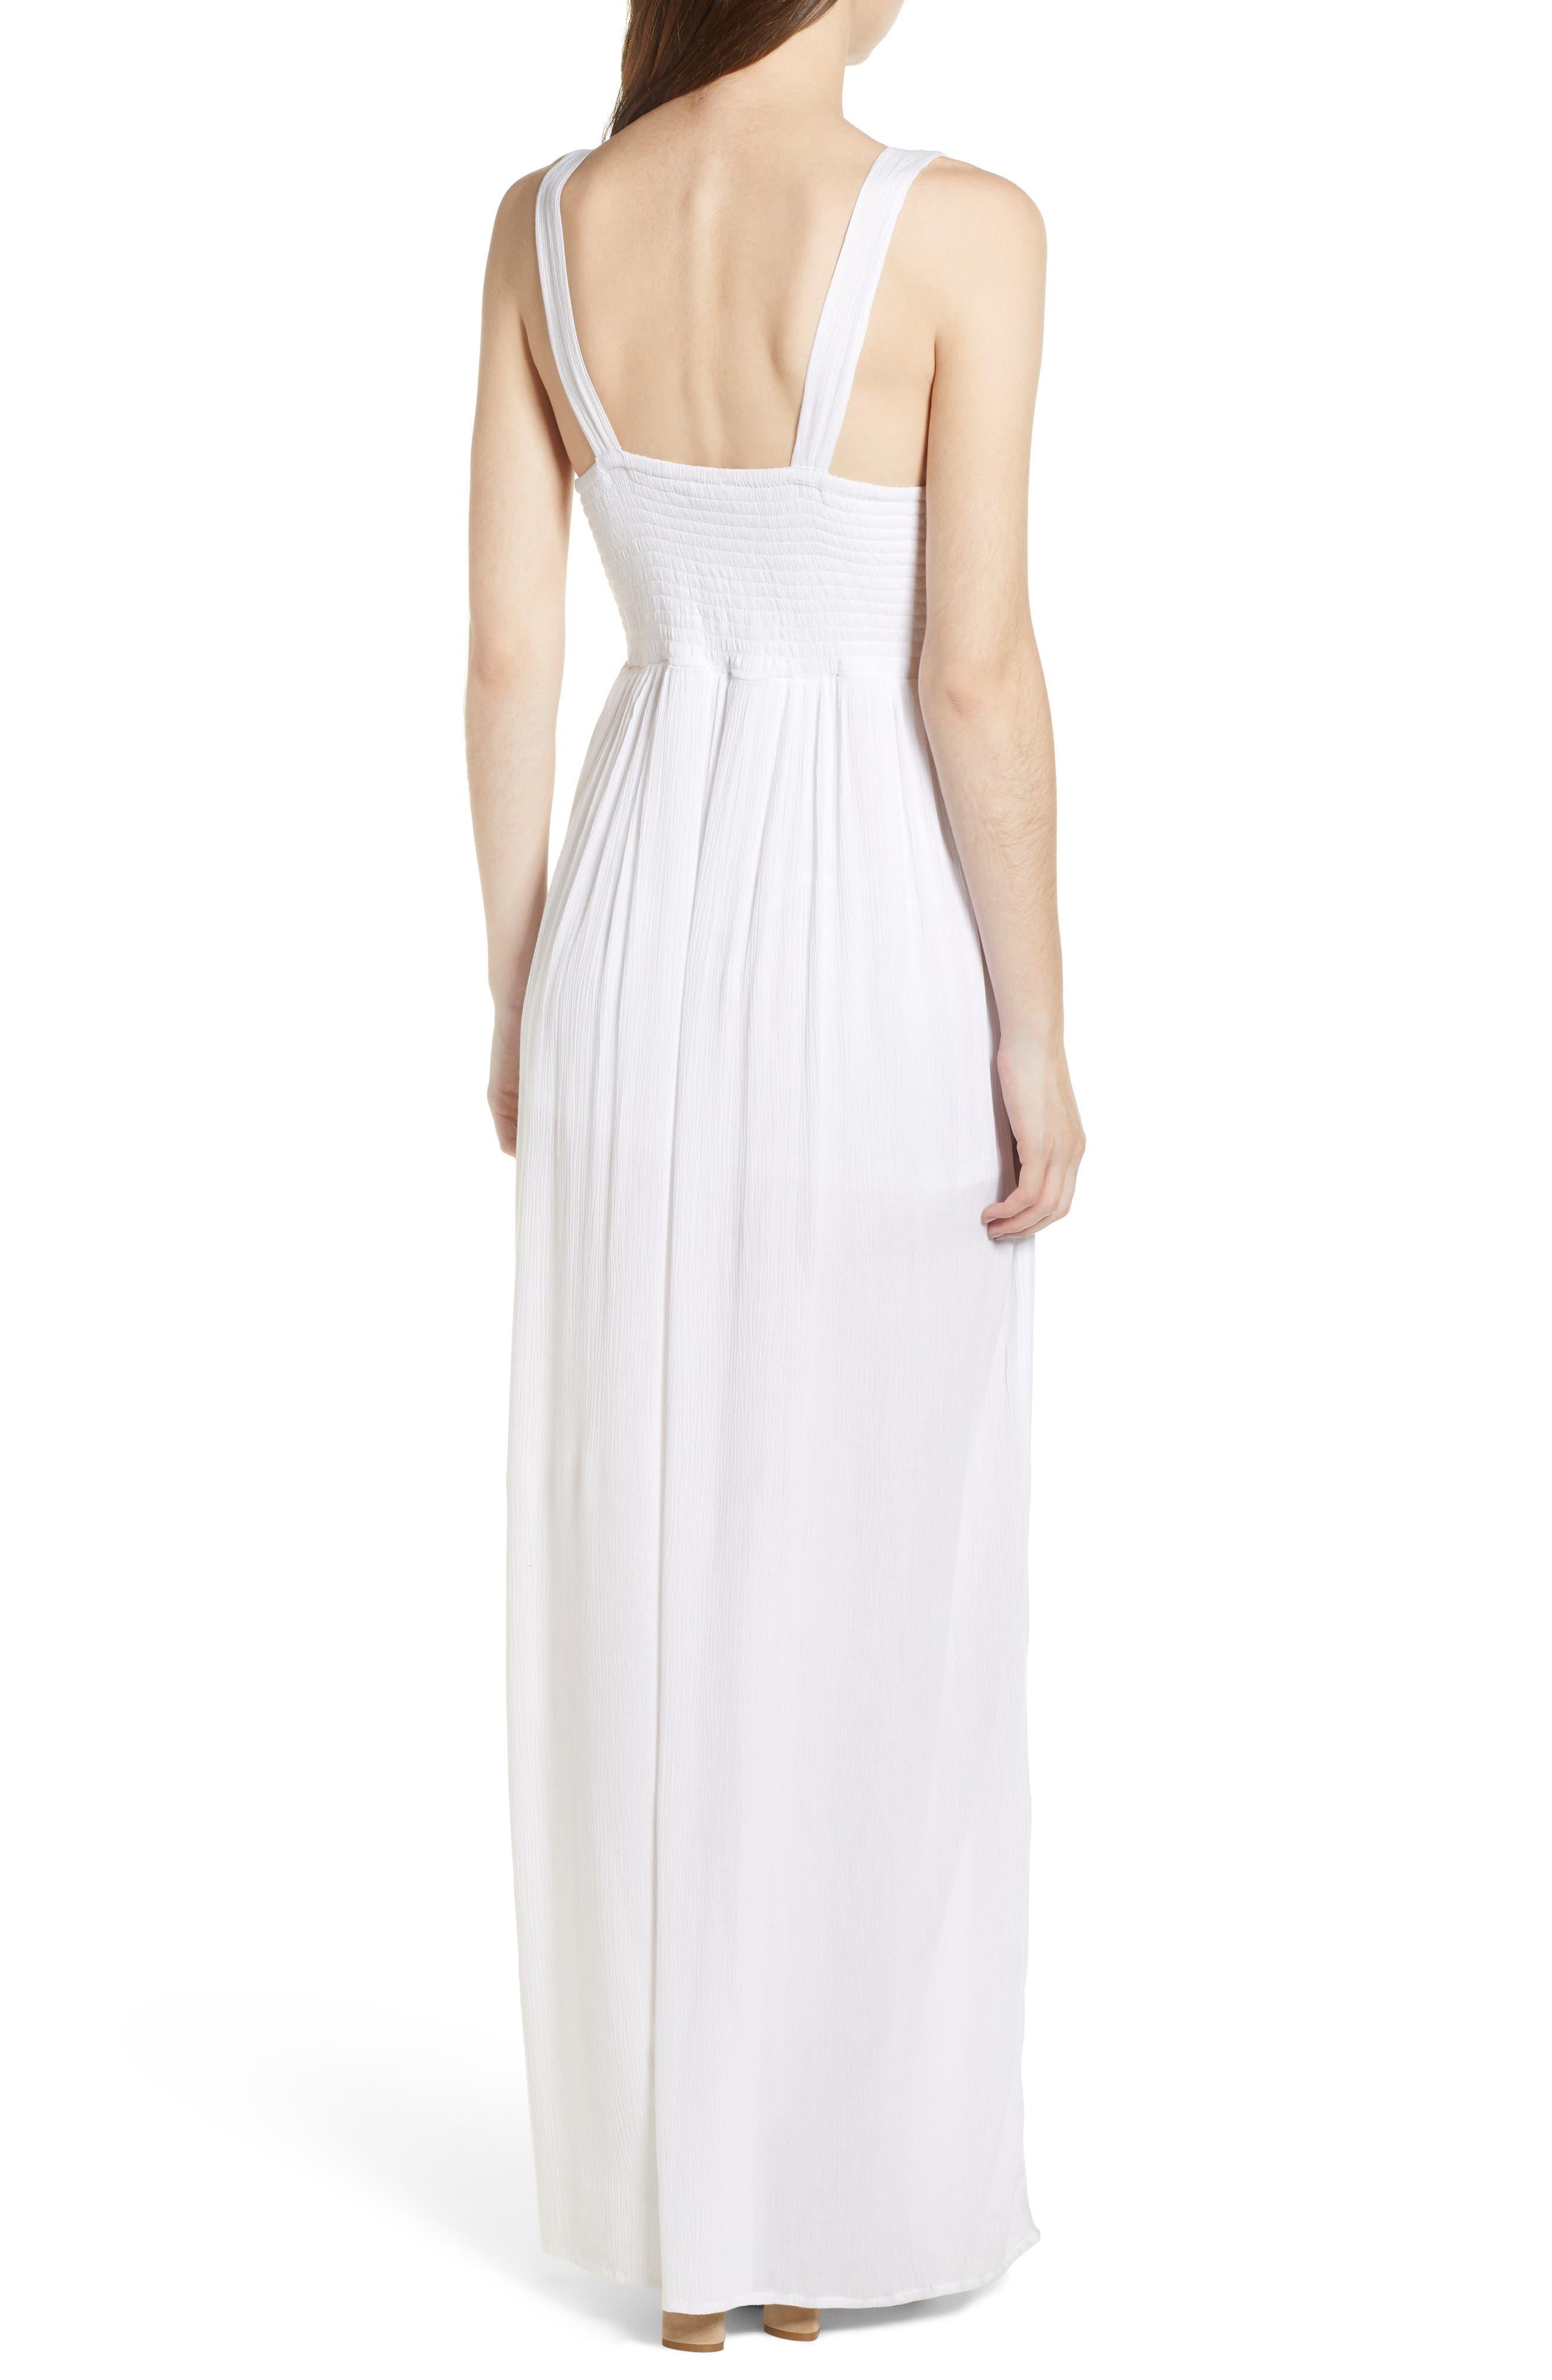 Bishop + Young Bora Bora Maxi Dress,                             Alternate thumbnail 2, color,                             White